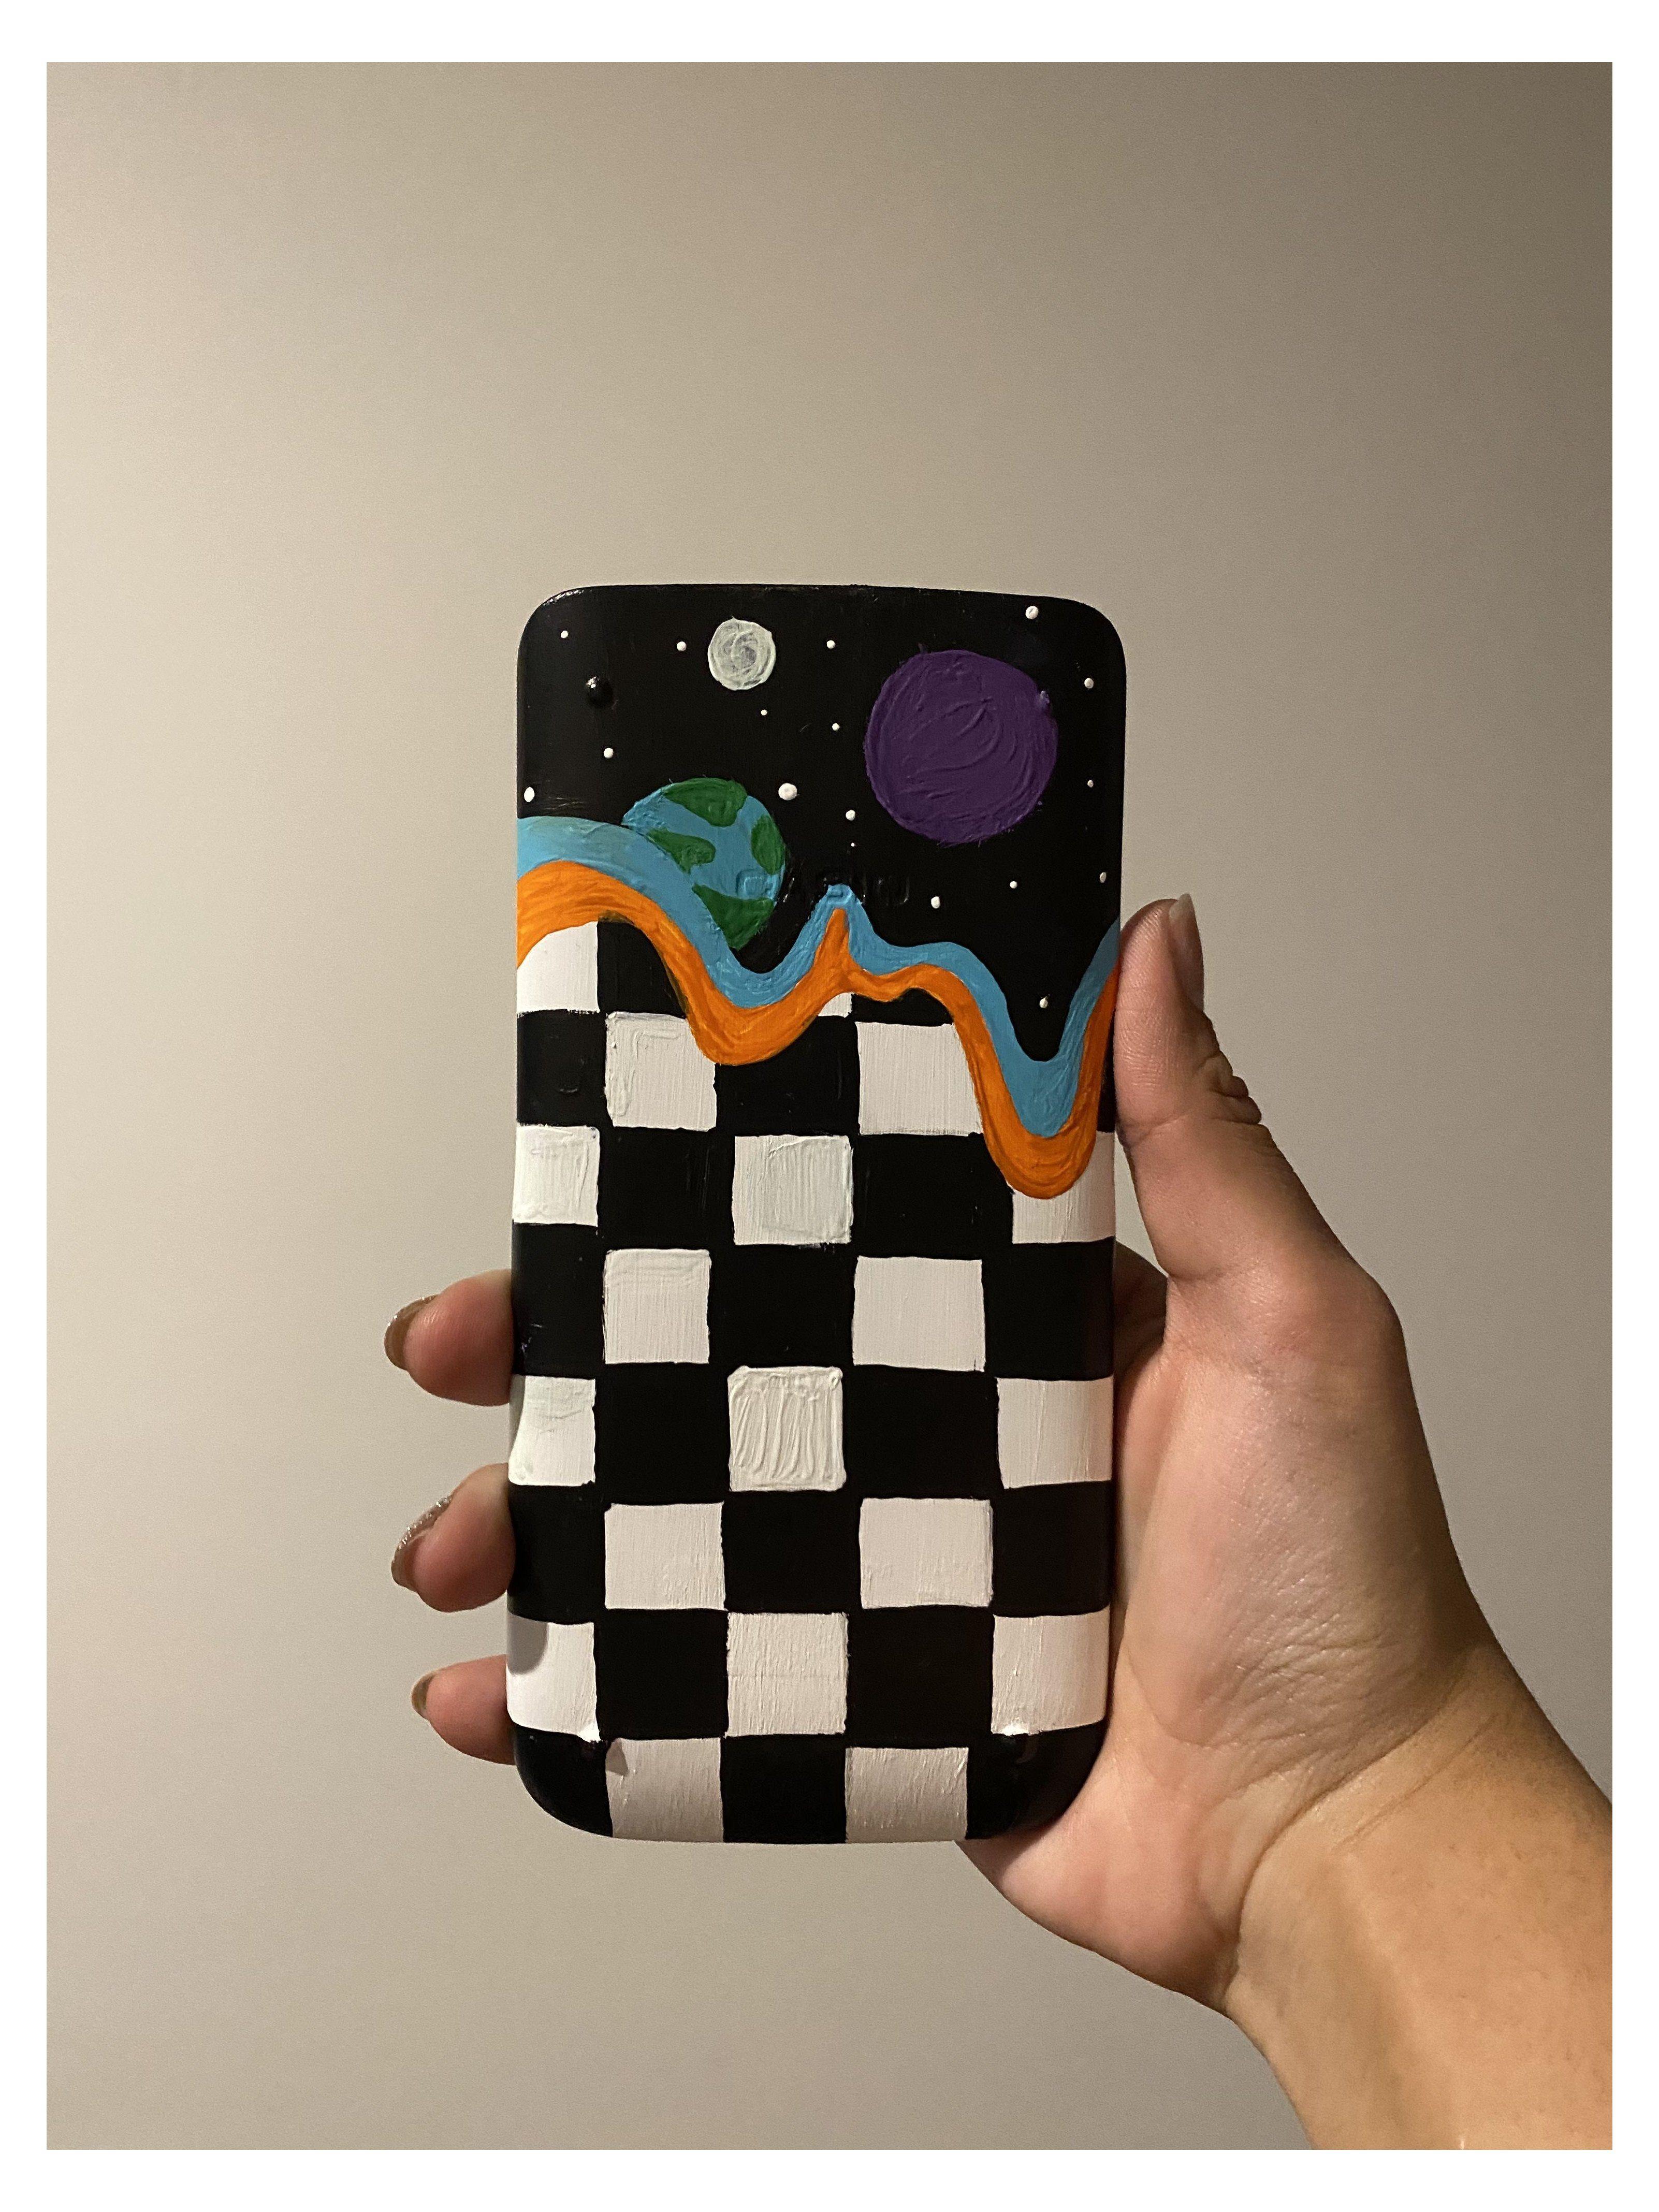 Boom trippy phone cases painting espero que les guste